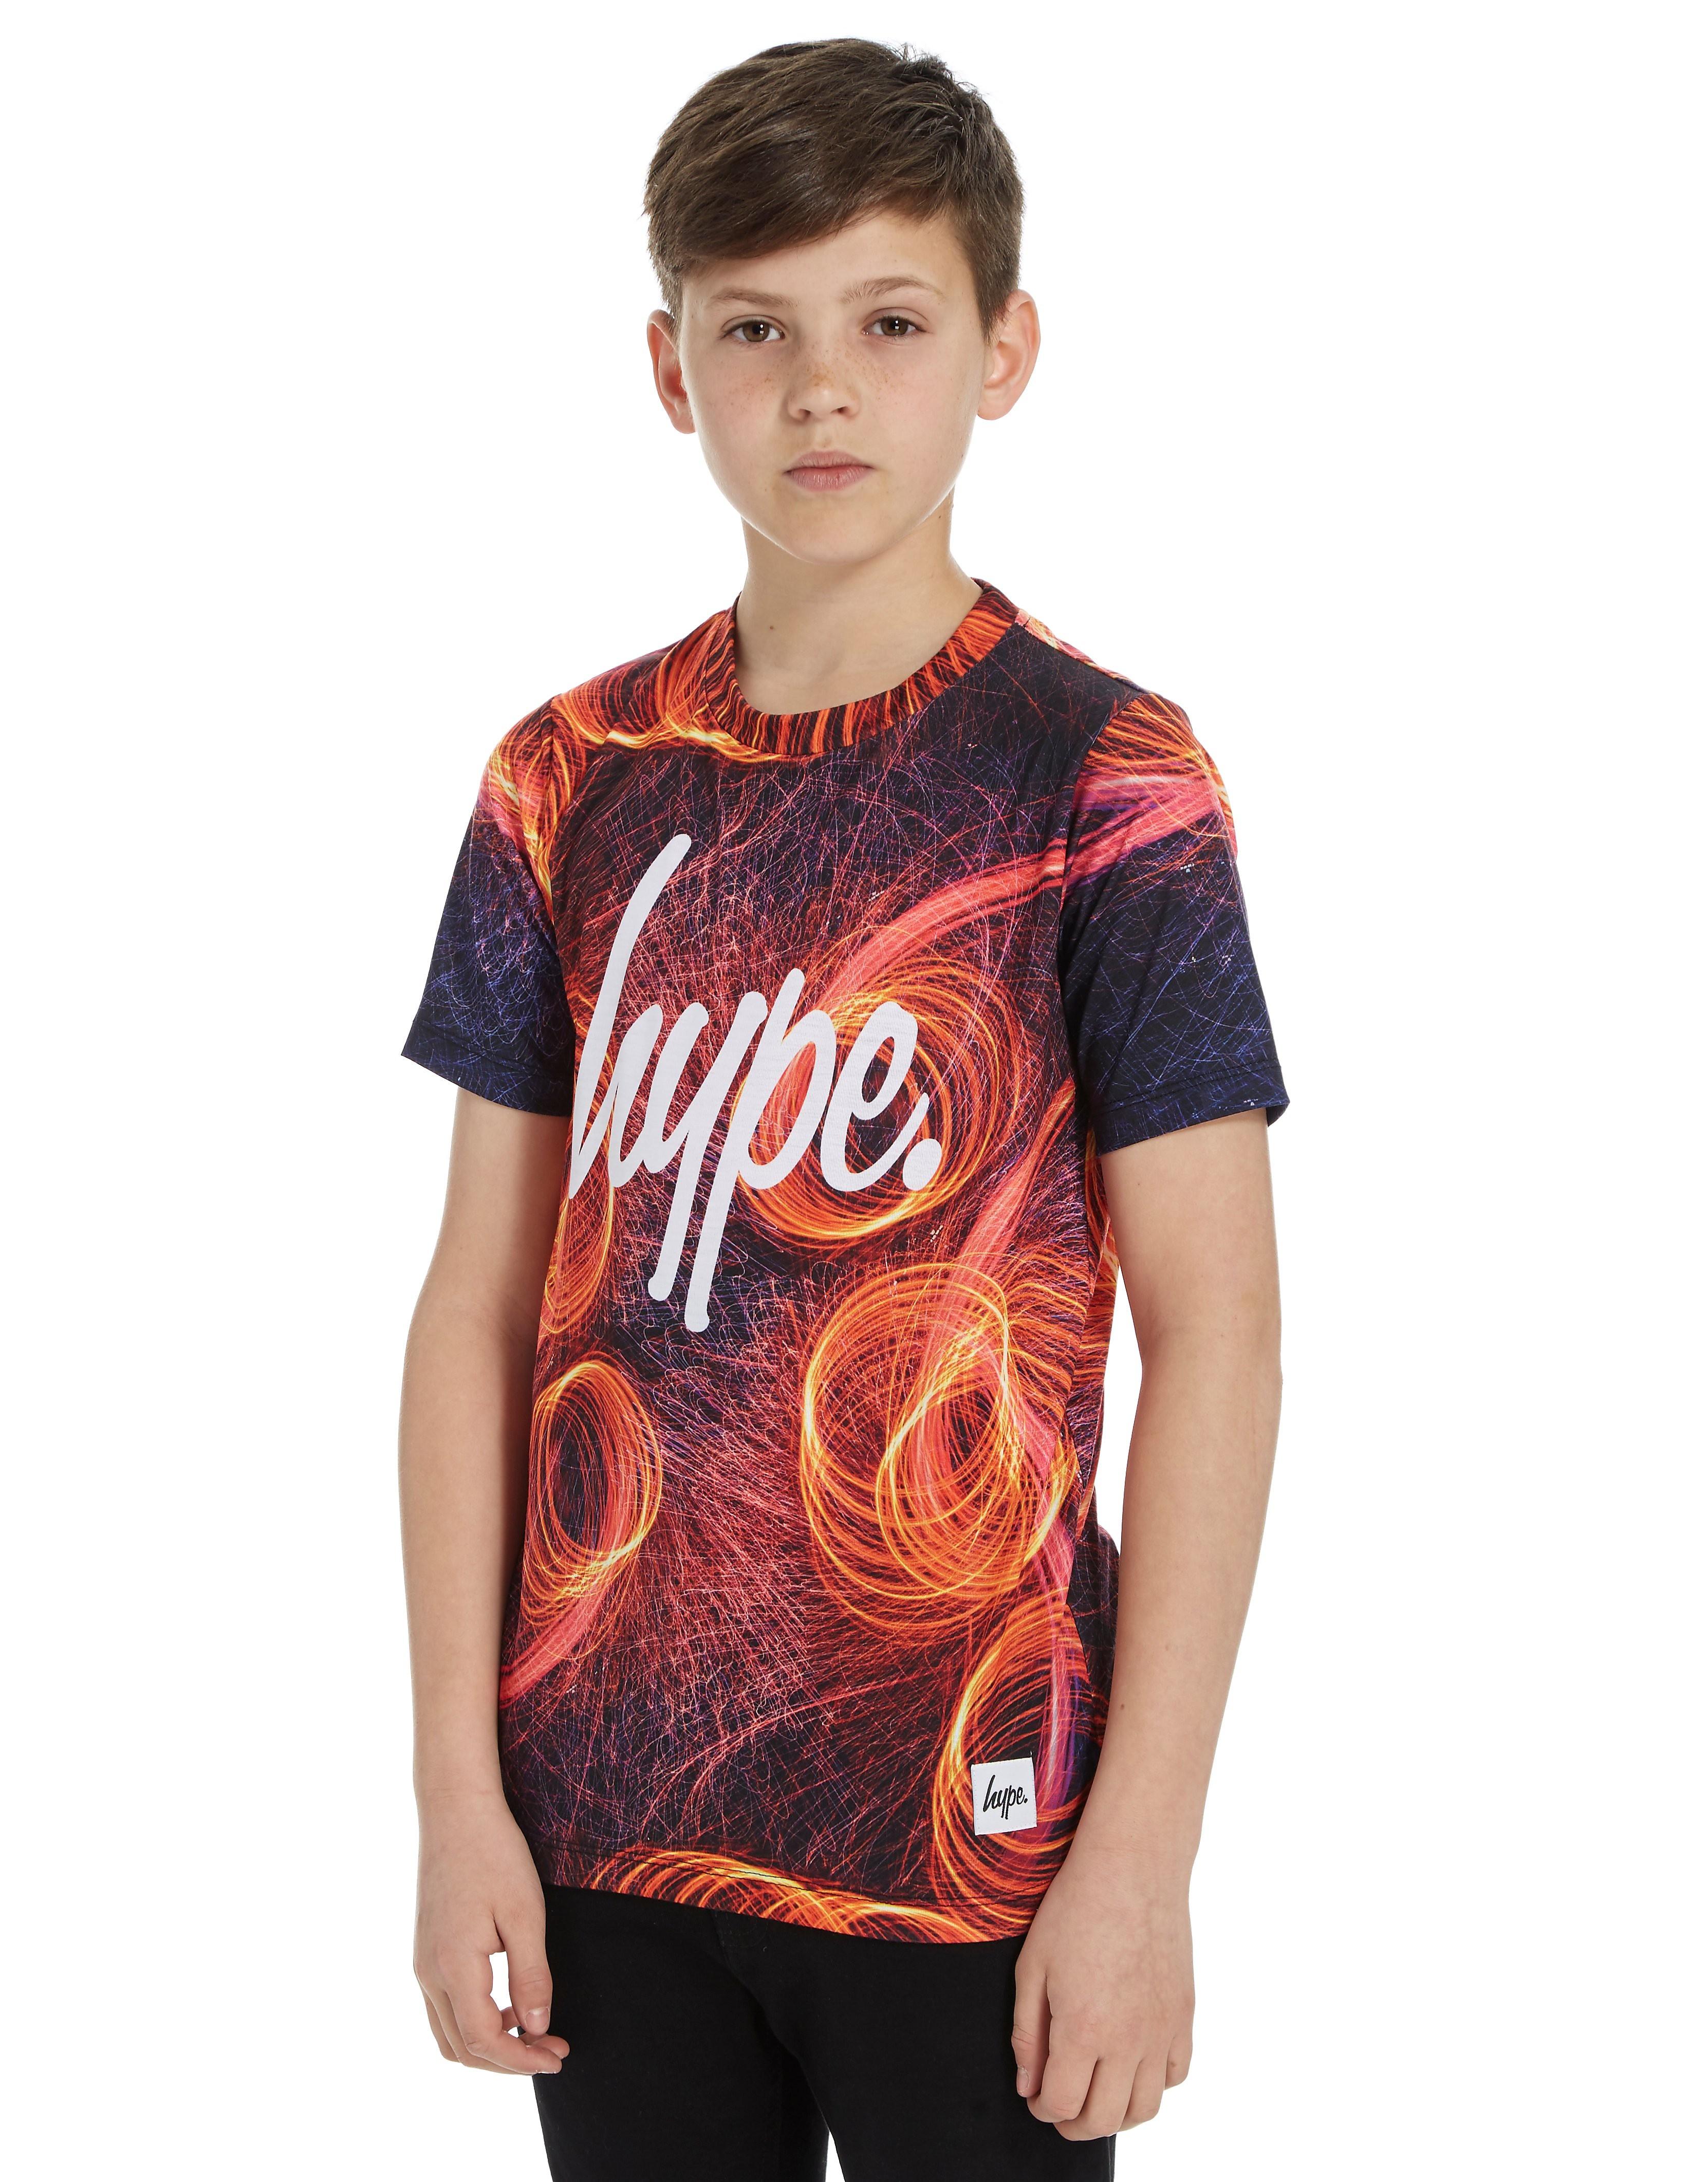 Hype Swirl T-Shirt